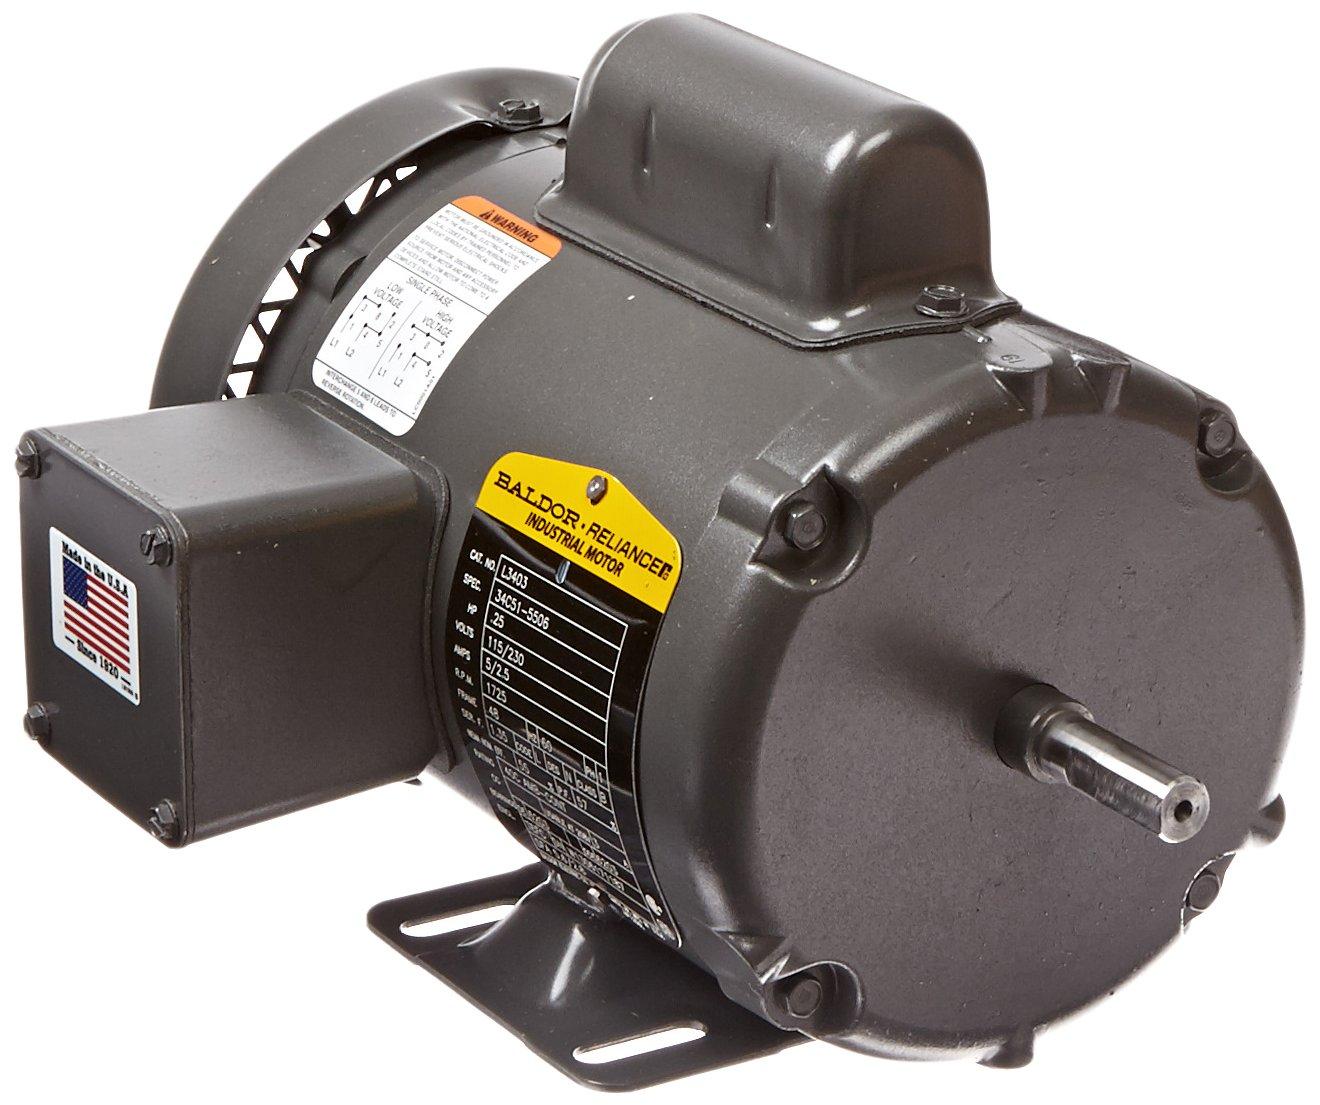 Baldor L3403 General Purpose AC Motor, Single Phase, 48 Frame, TEFC Enclosure, 1/4Hp Output, 1725rpm, 60Hz, 115/230V Voltage